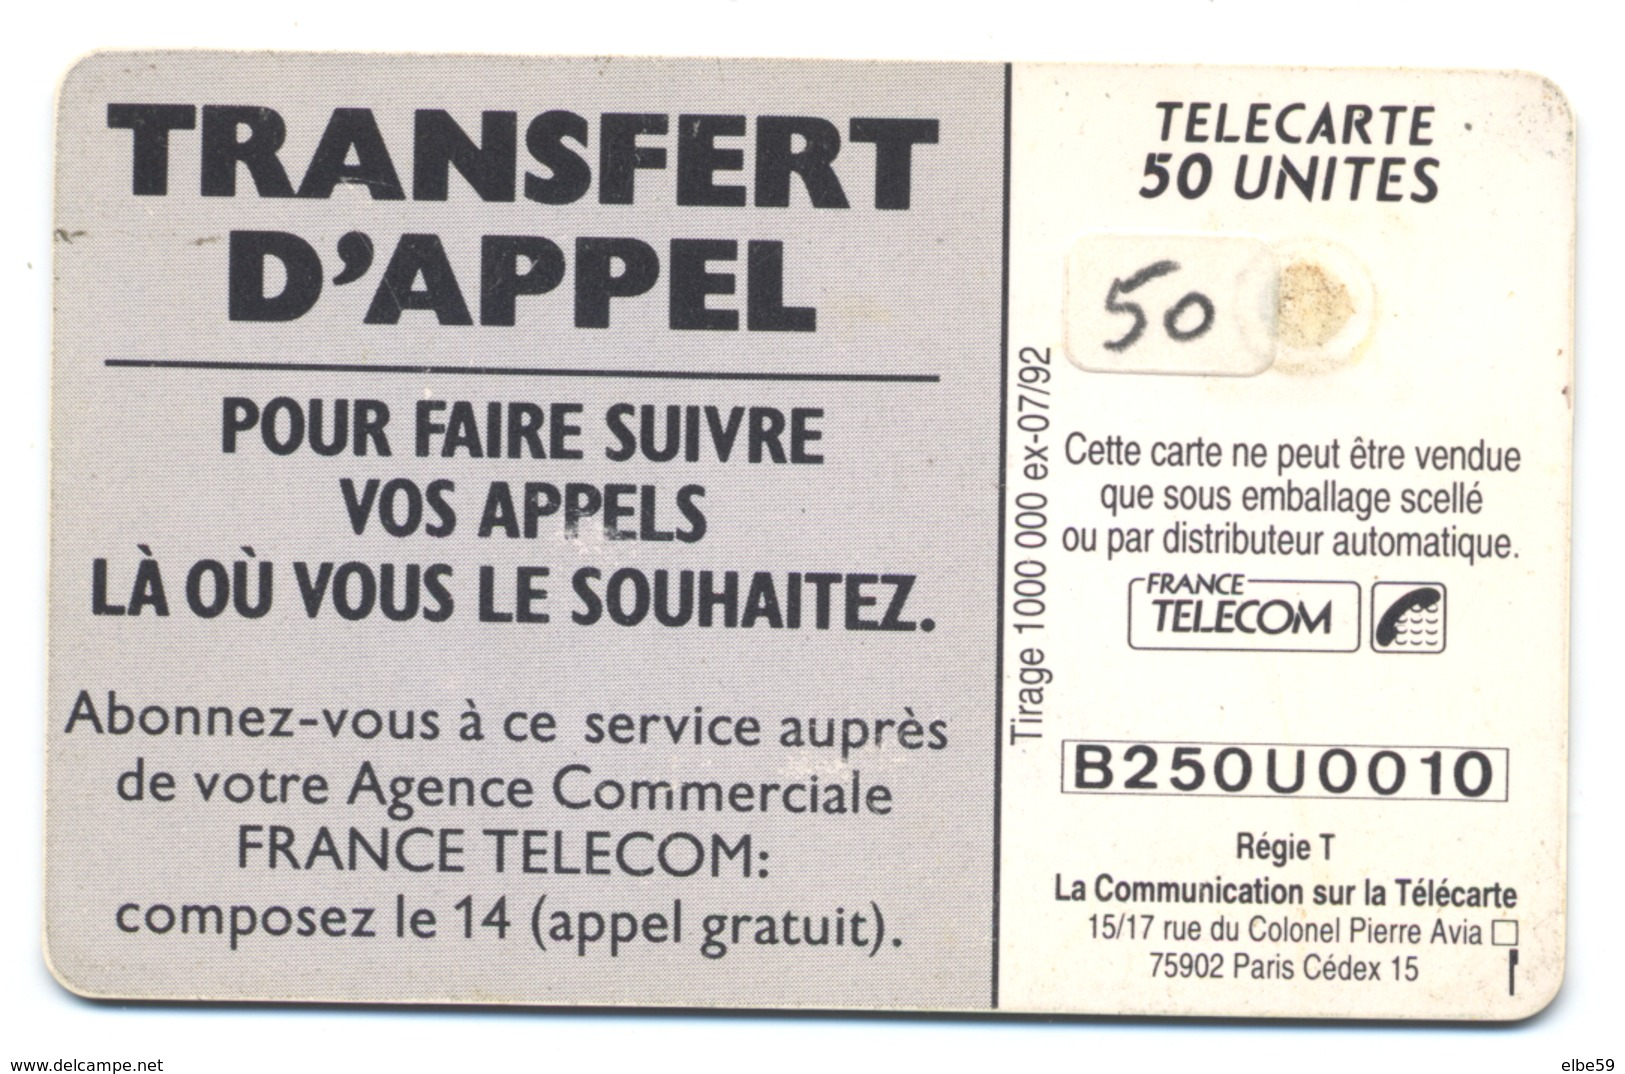 France, Telecom, Telecarte 50, Thème, Téléphones, Transfert D'appel, Plage - Telefoni